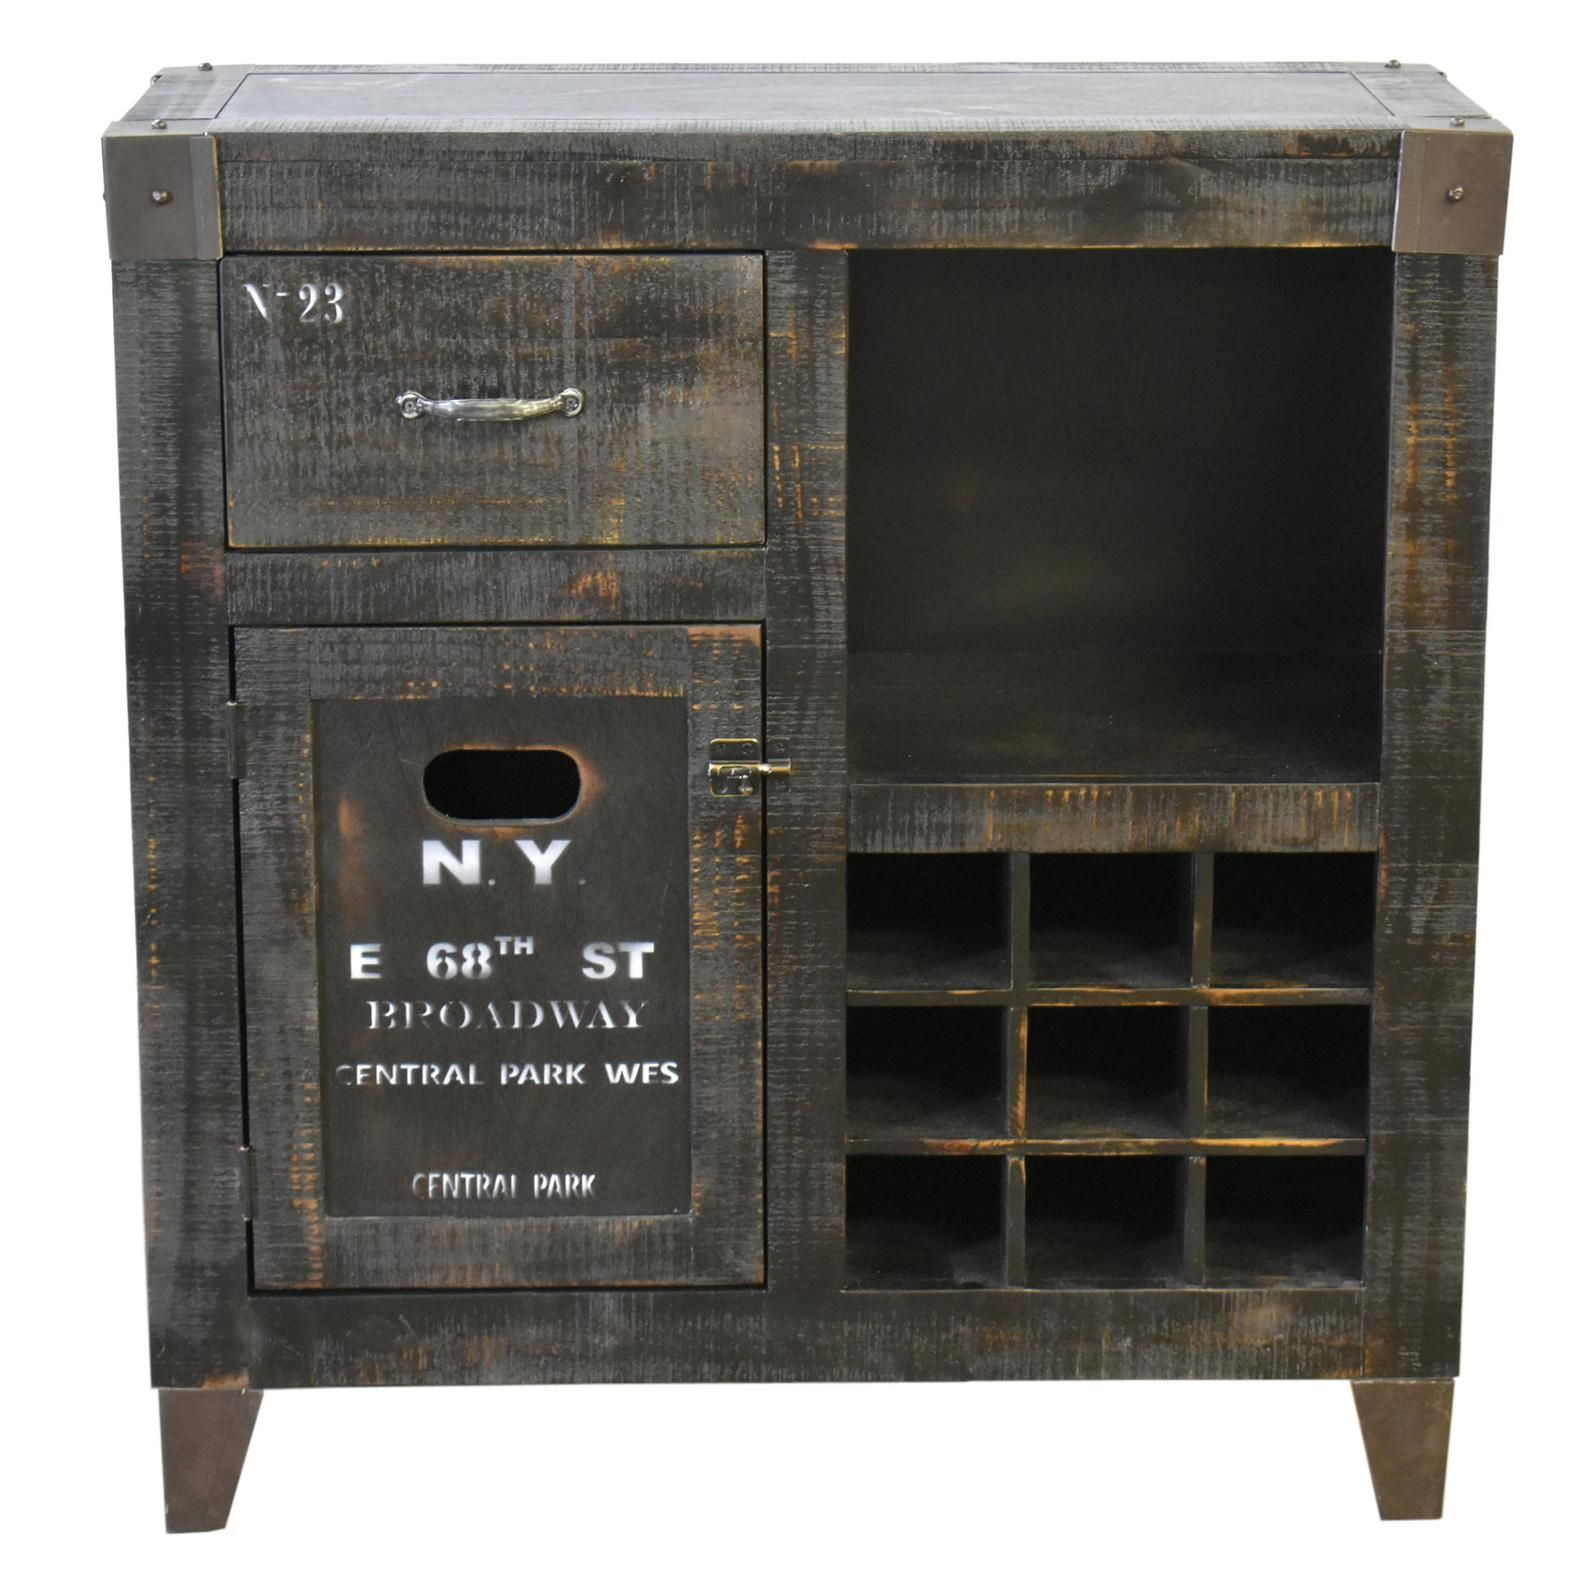 Graffiti Solid Wood Wine Cabinet /& Bar New York